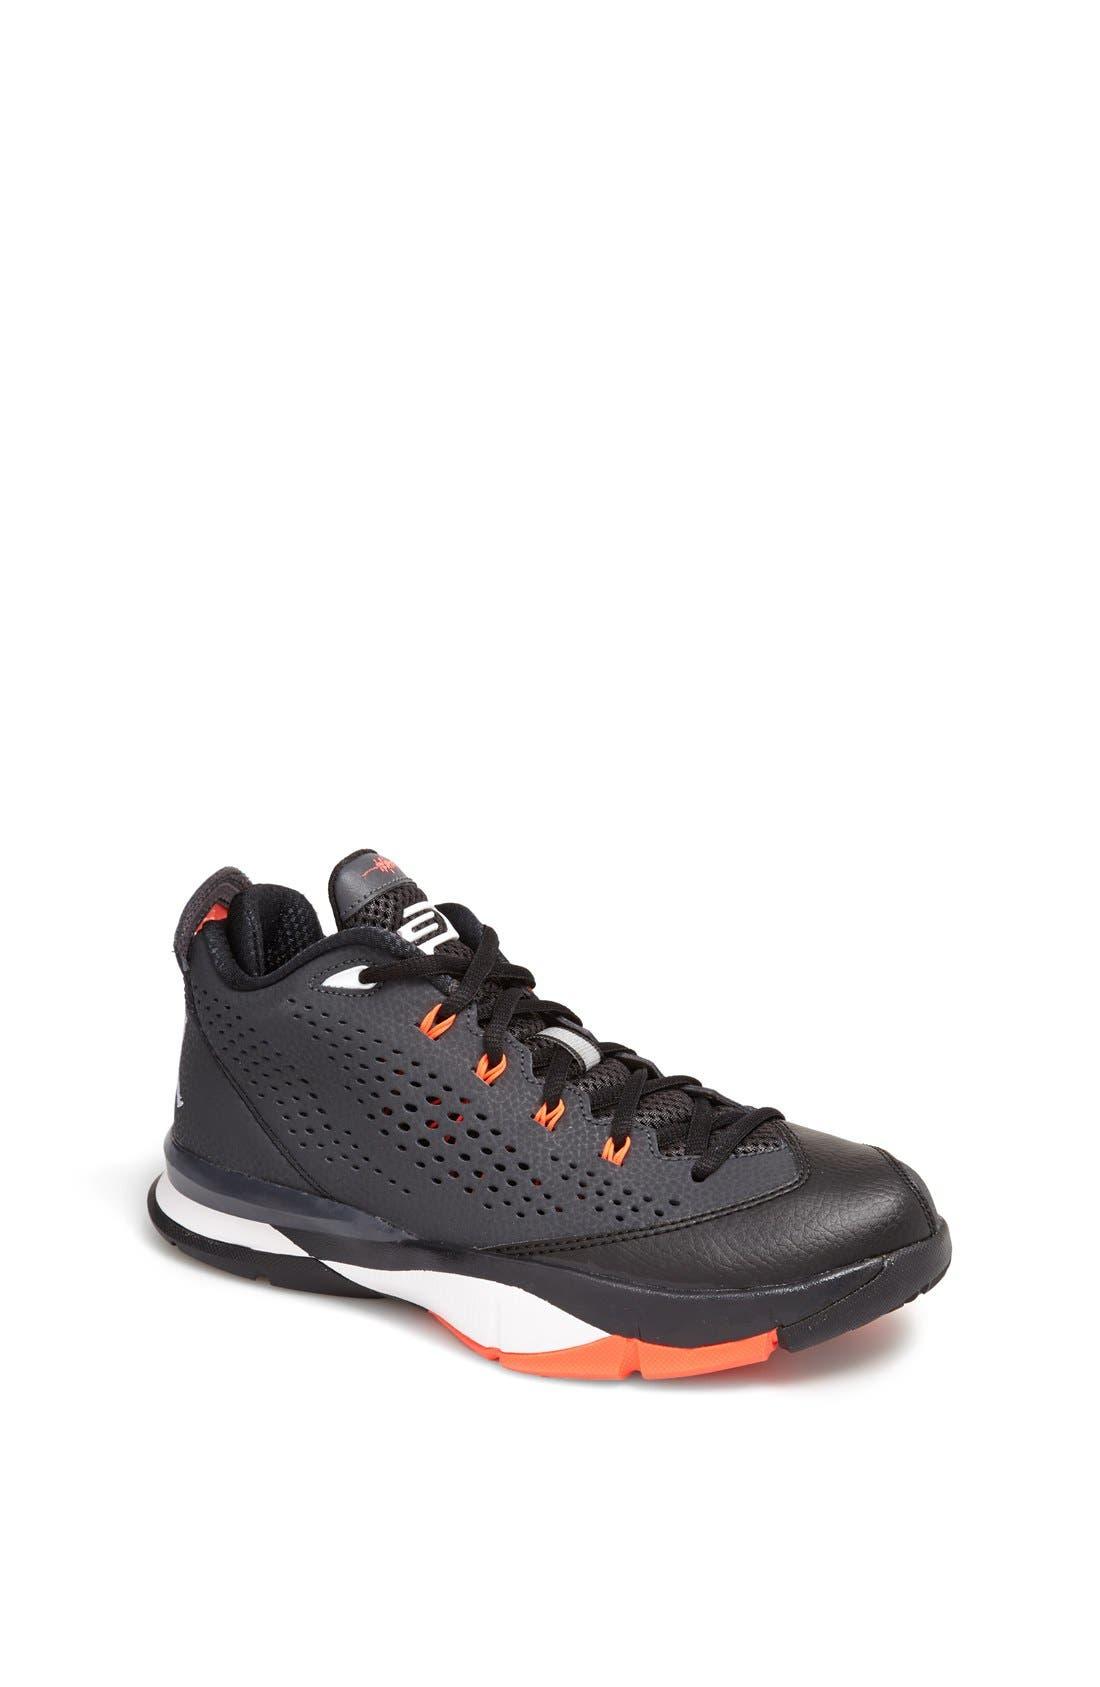 Alternate Image 1 Selected - Nike 'Jordan CP3.VII' Sneaker (Big Kid)